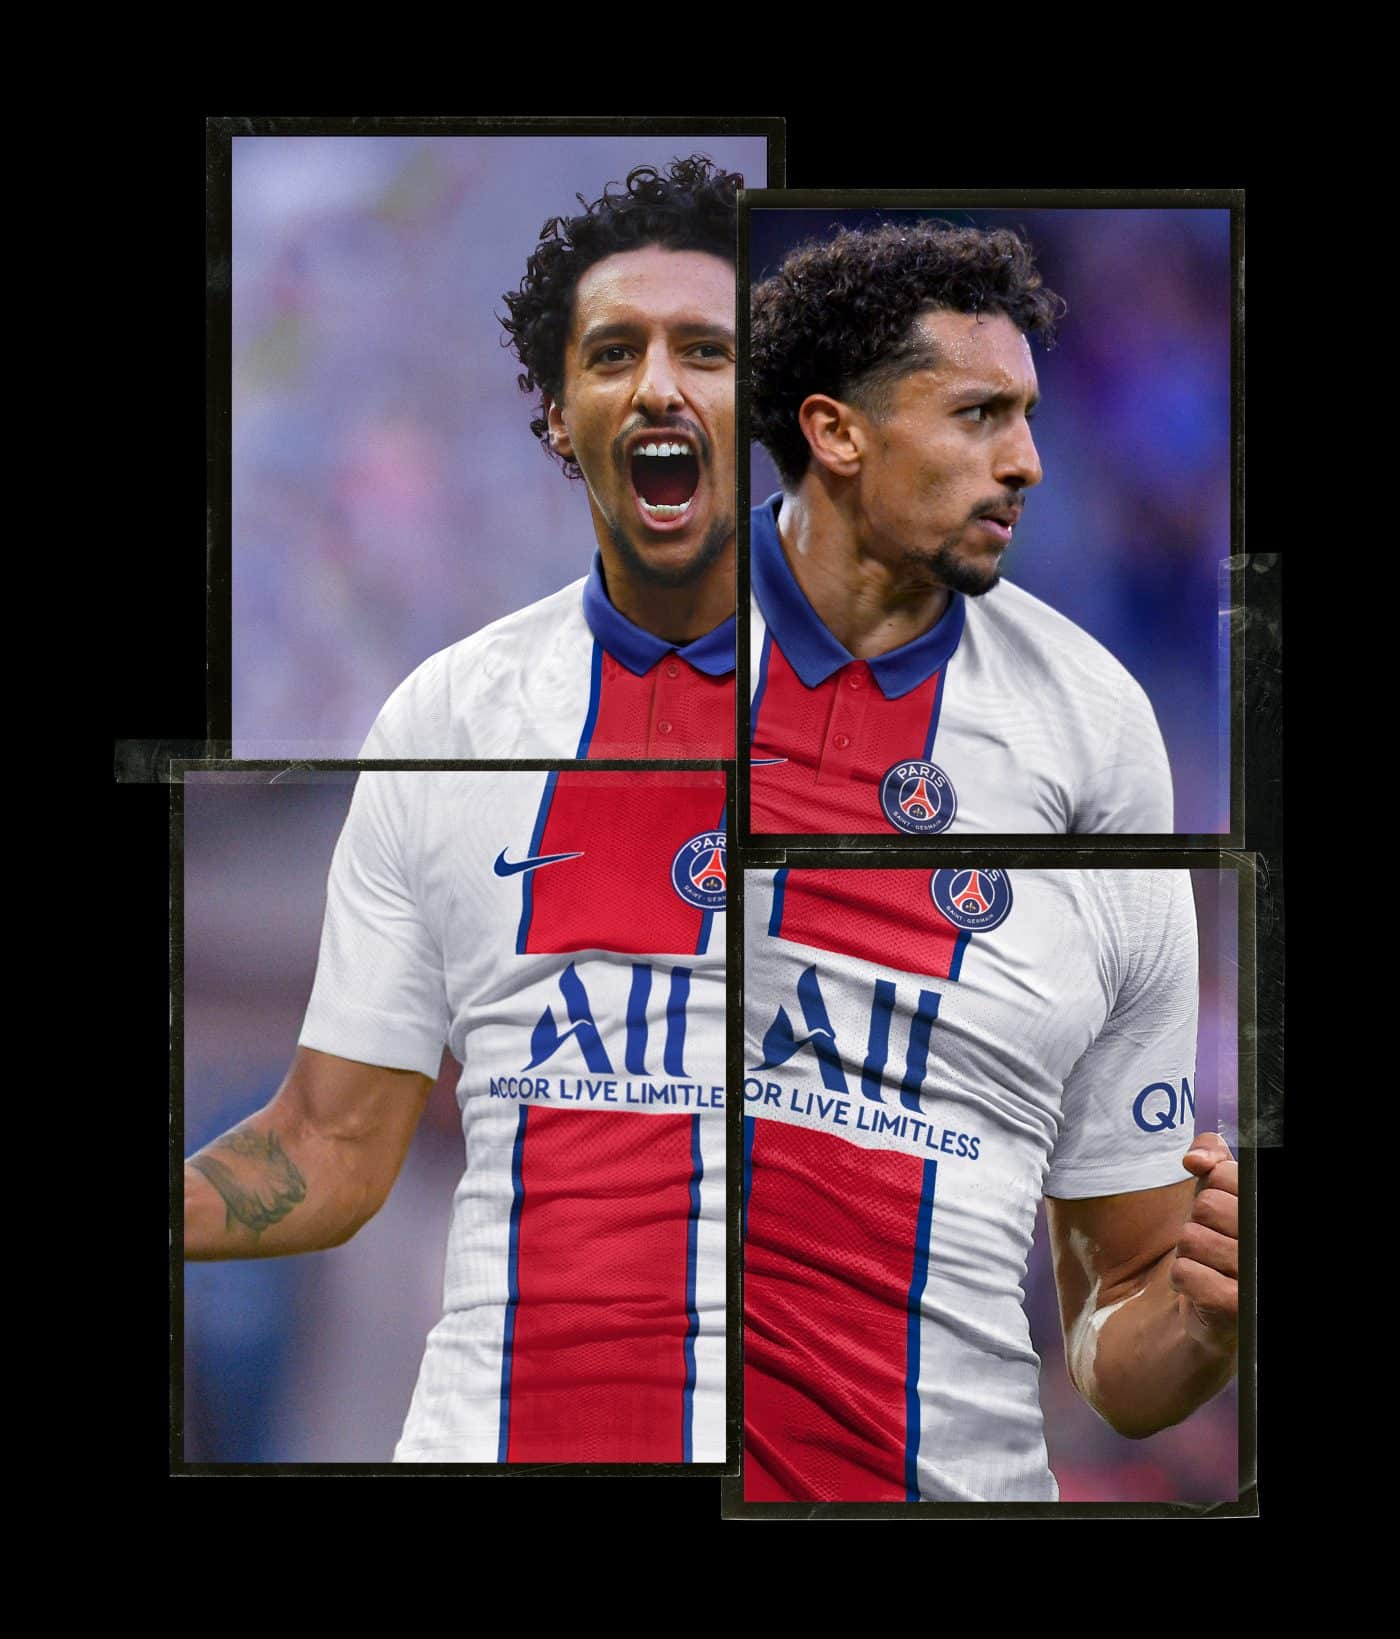 maillot-exterieur-psg-2020-2021-paris-saint-germain-nike-3